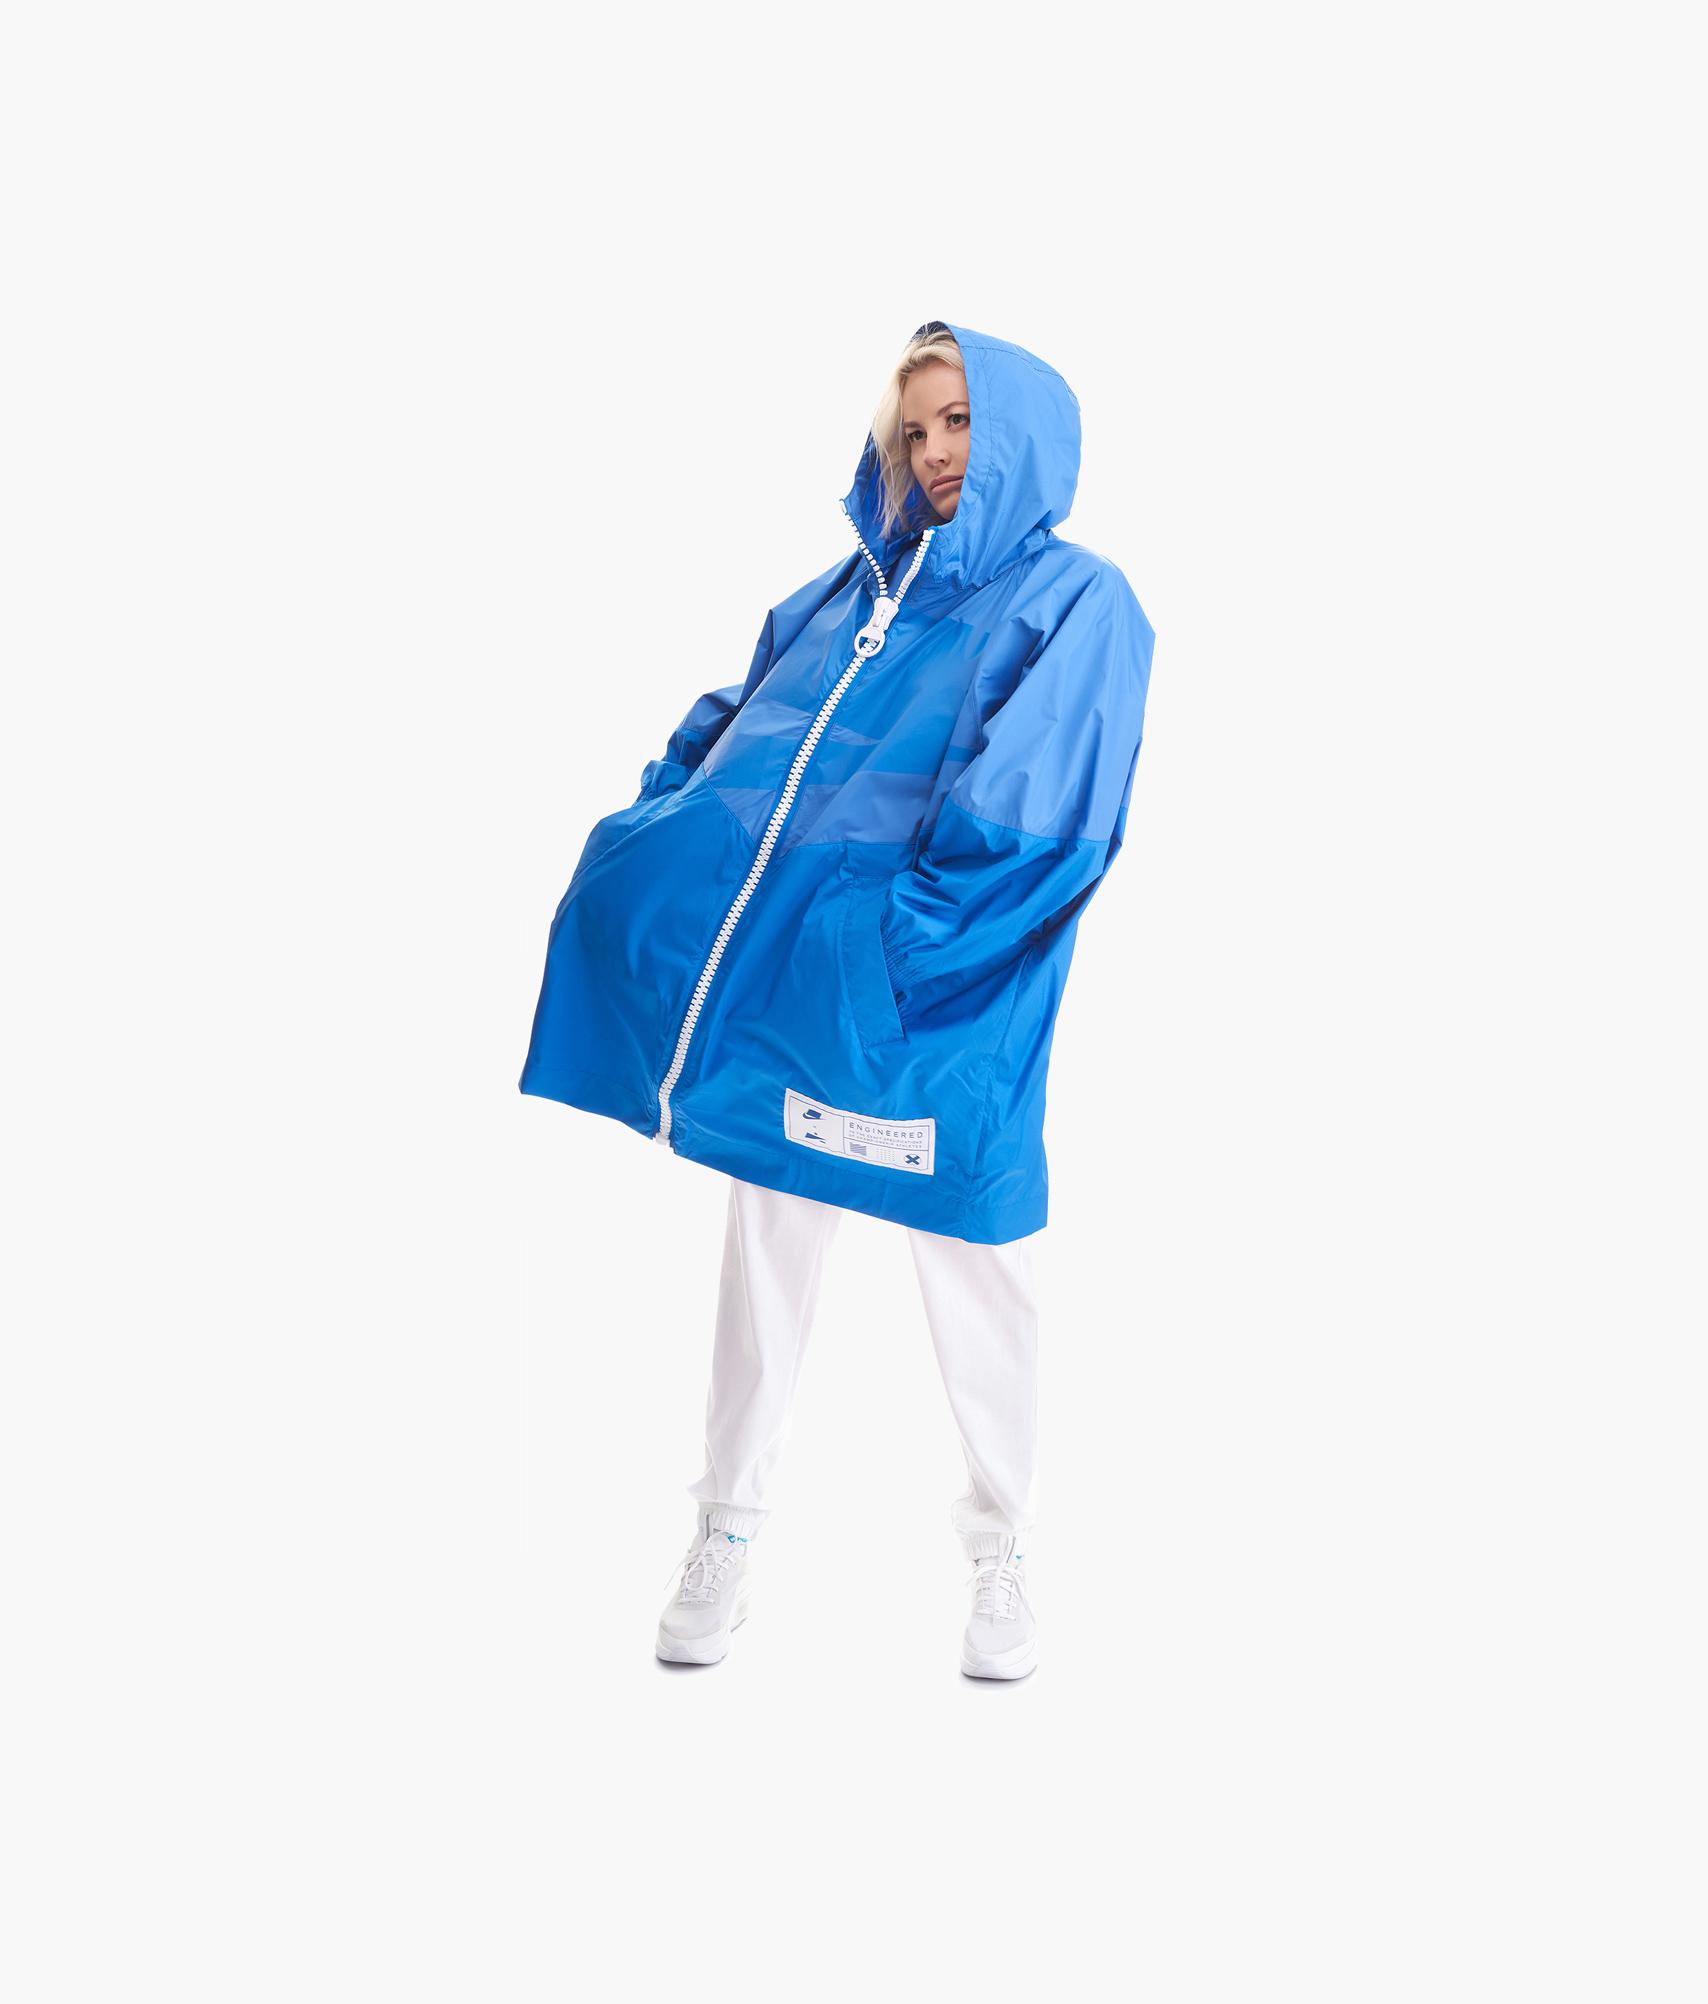 цена на Плащ женский Nike Nike Цвет-Синий